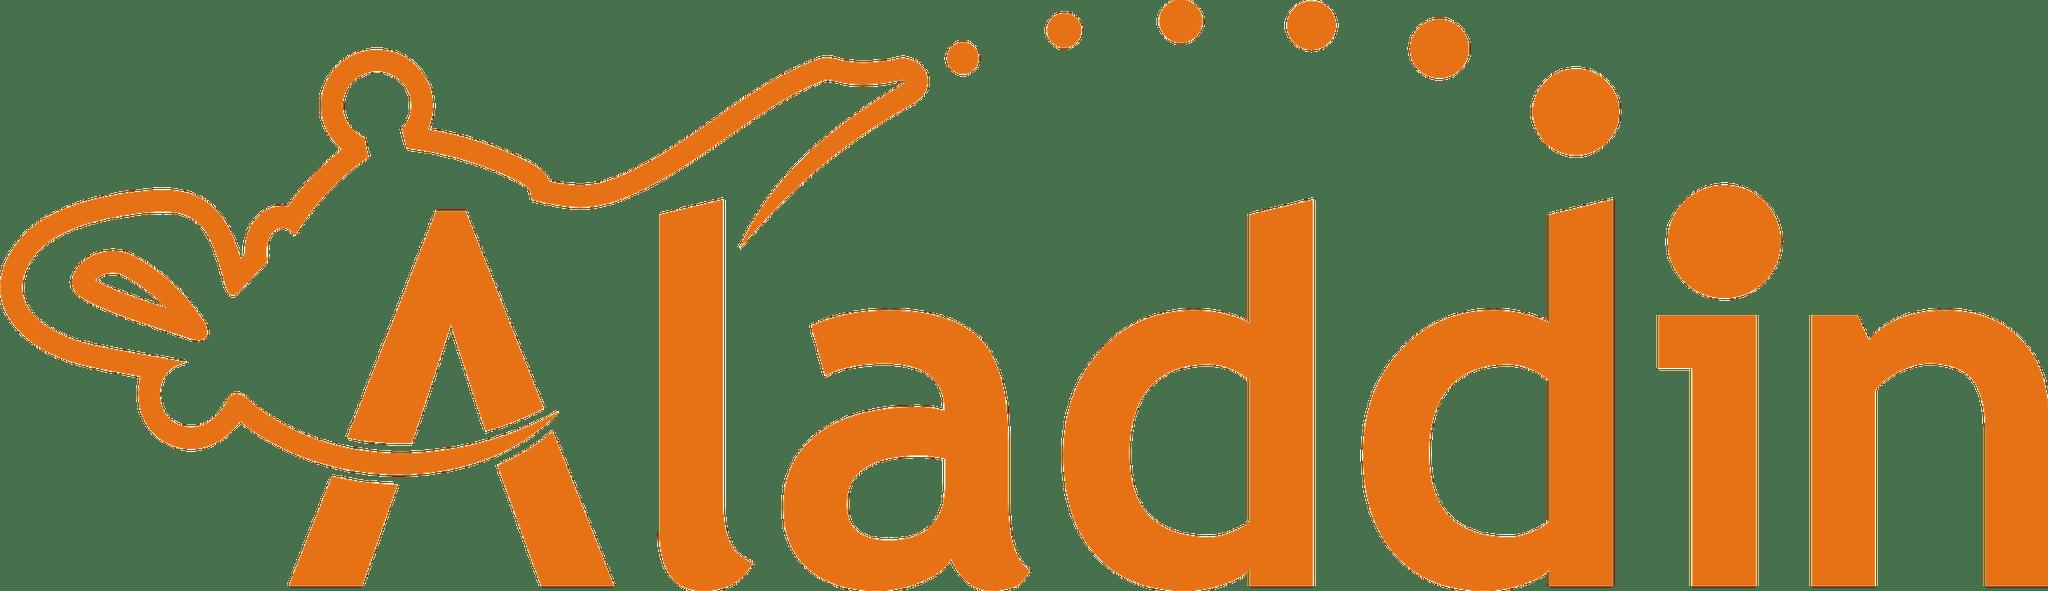 AladdinB2B Inc.